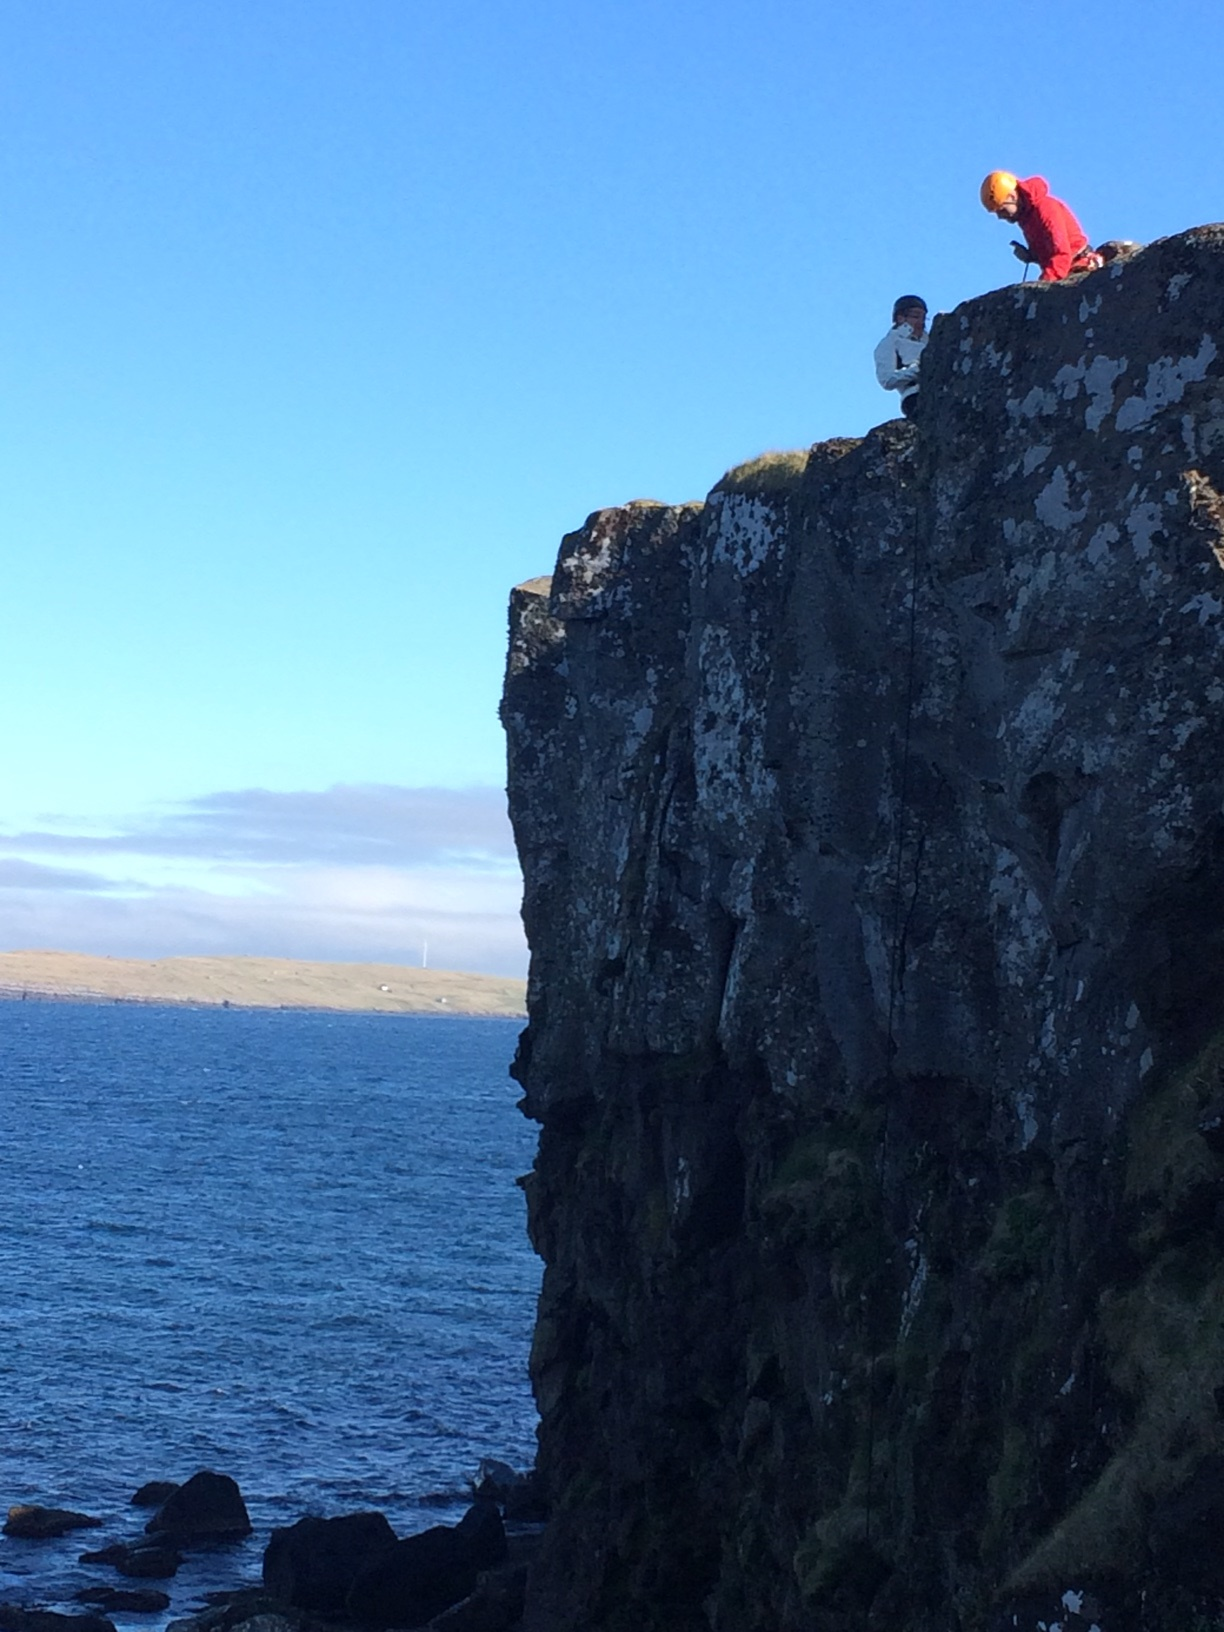 Rappelling in the Faroe Islands ©tmf dialogue marketing